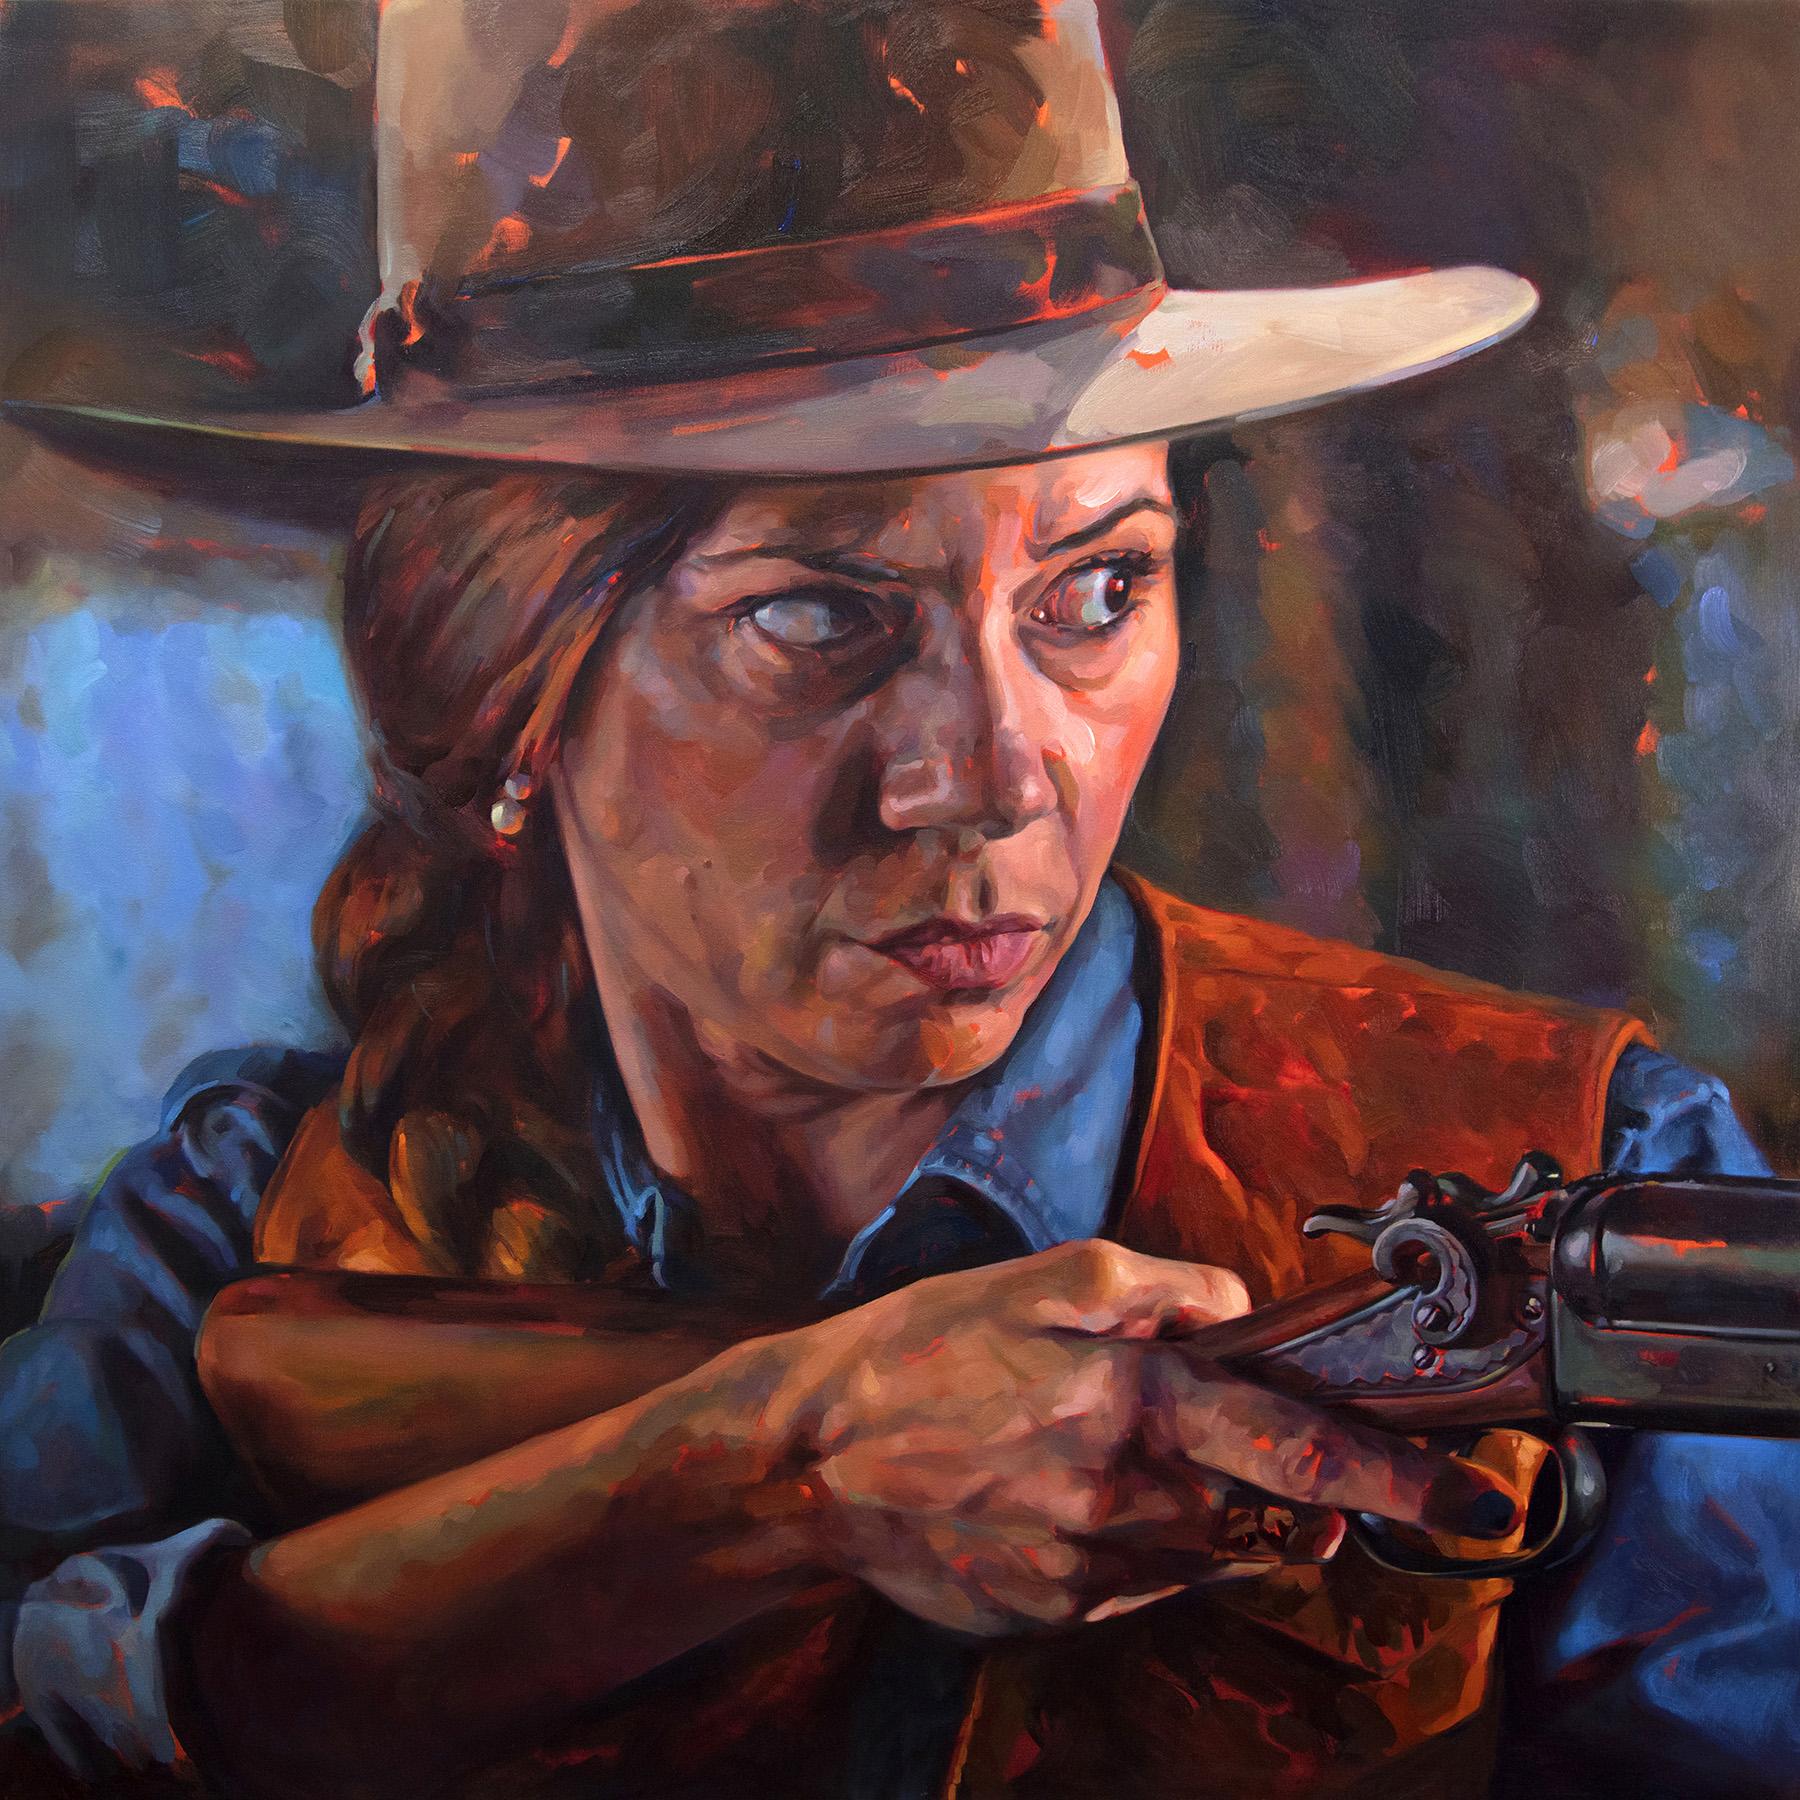 Gabriella Eastwood in Unforgiven